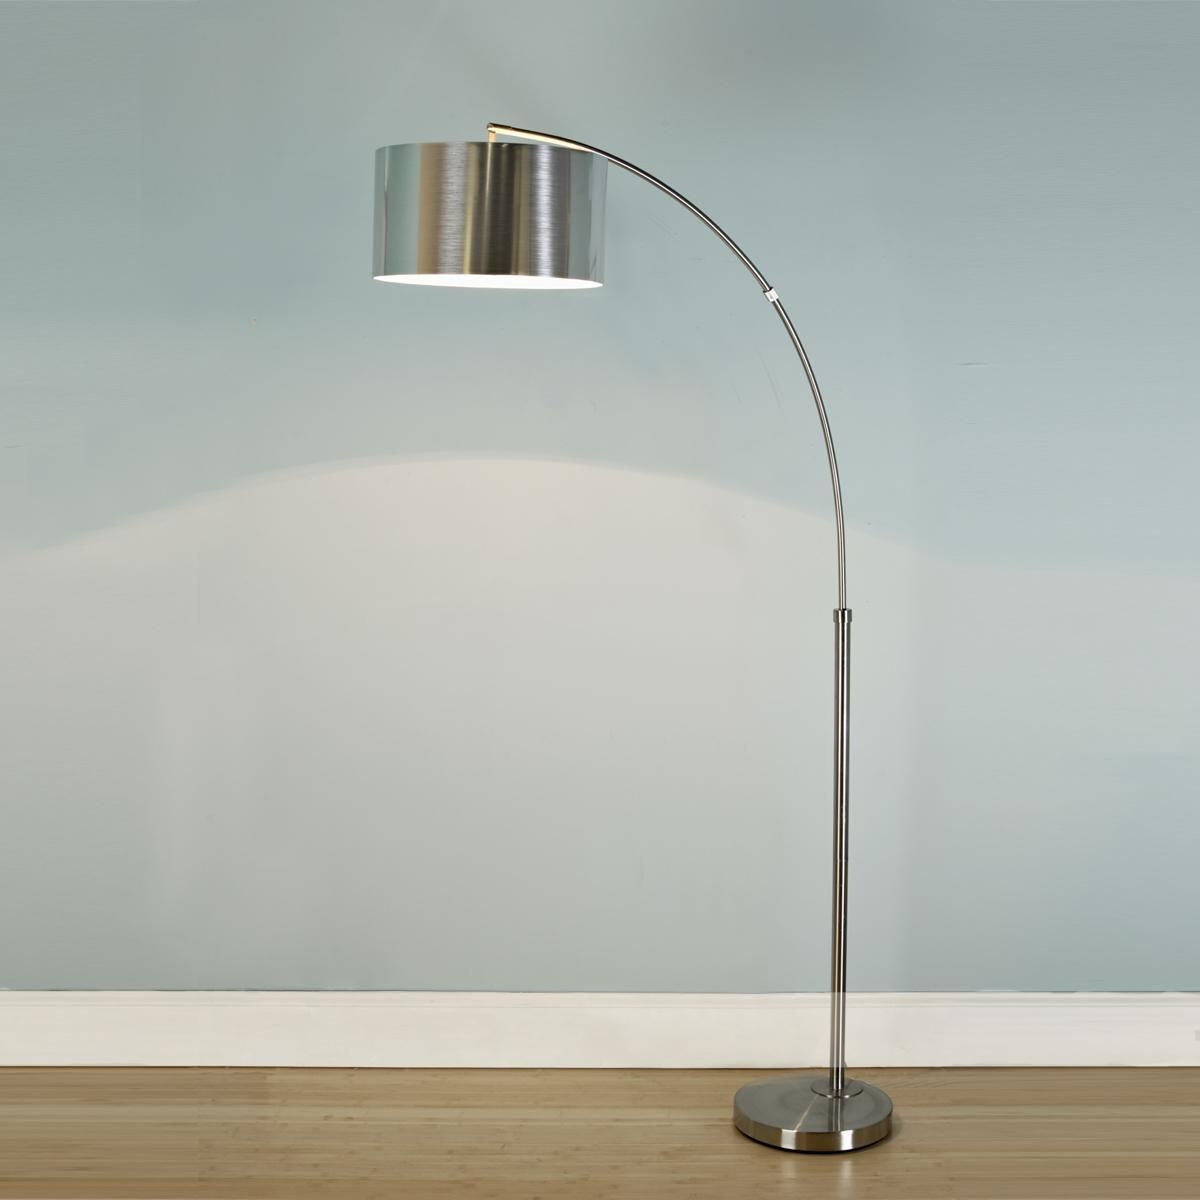 Nickel Arc Floor Lamp With Silver Drum Shade Slick Silver